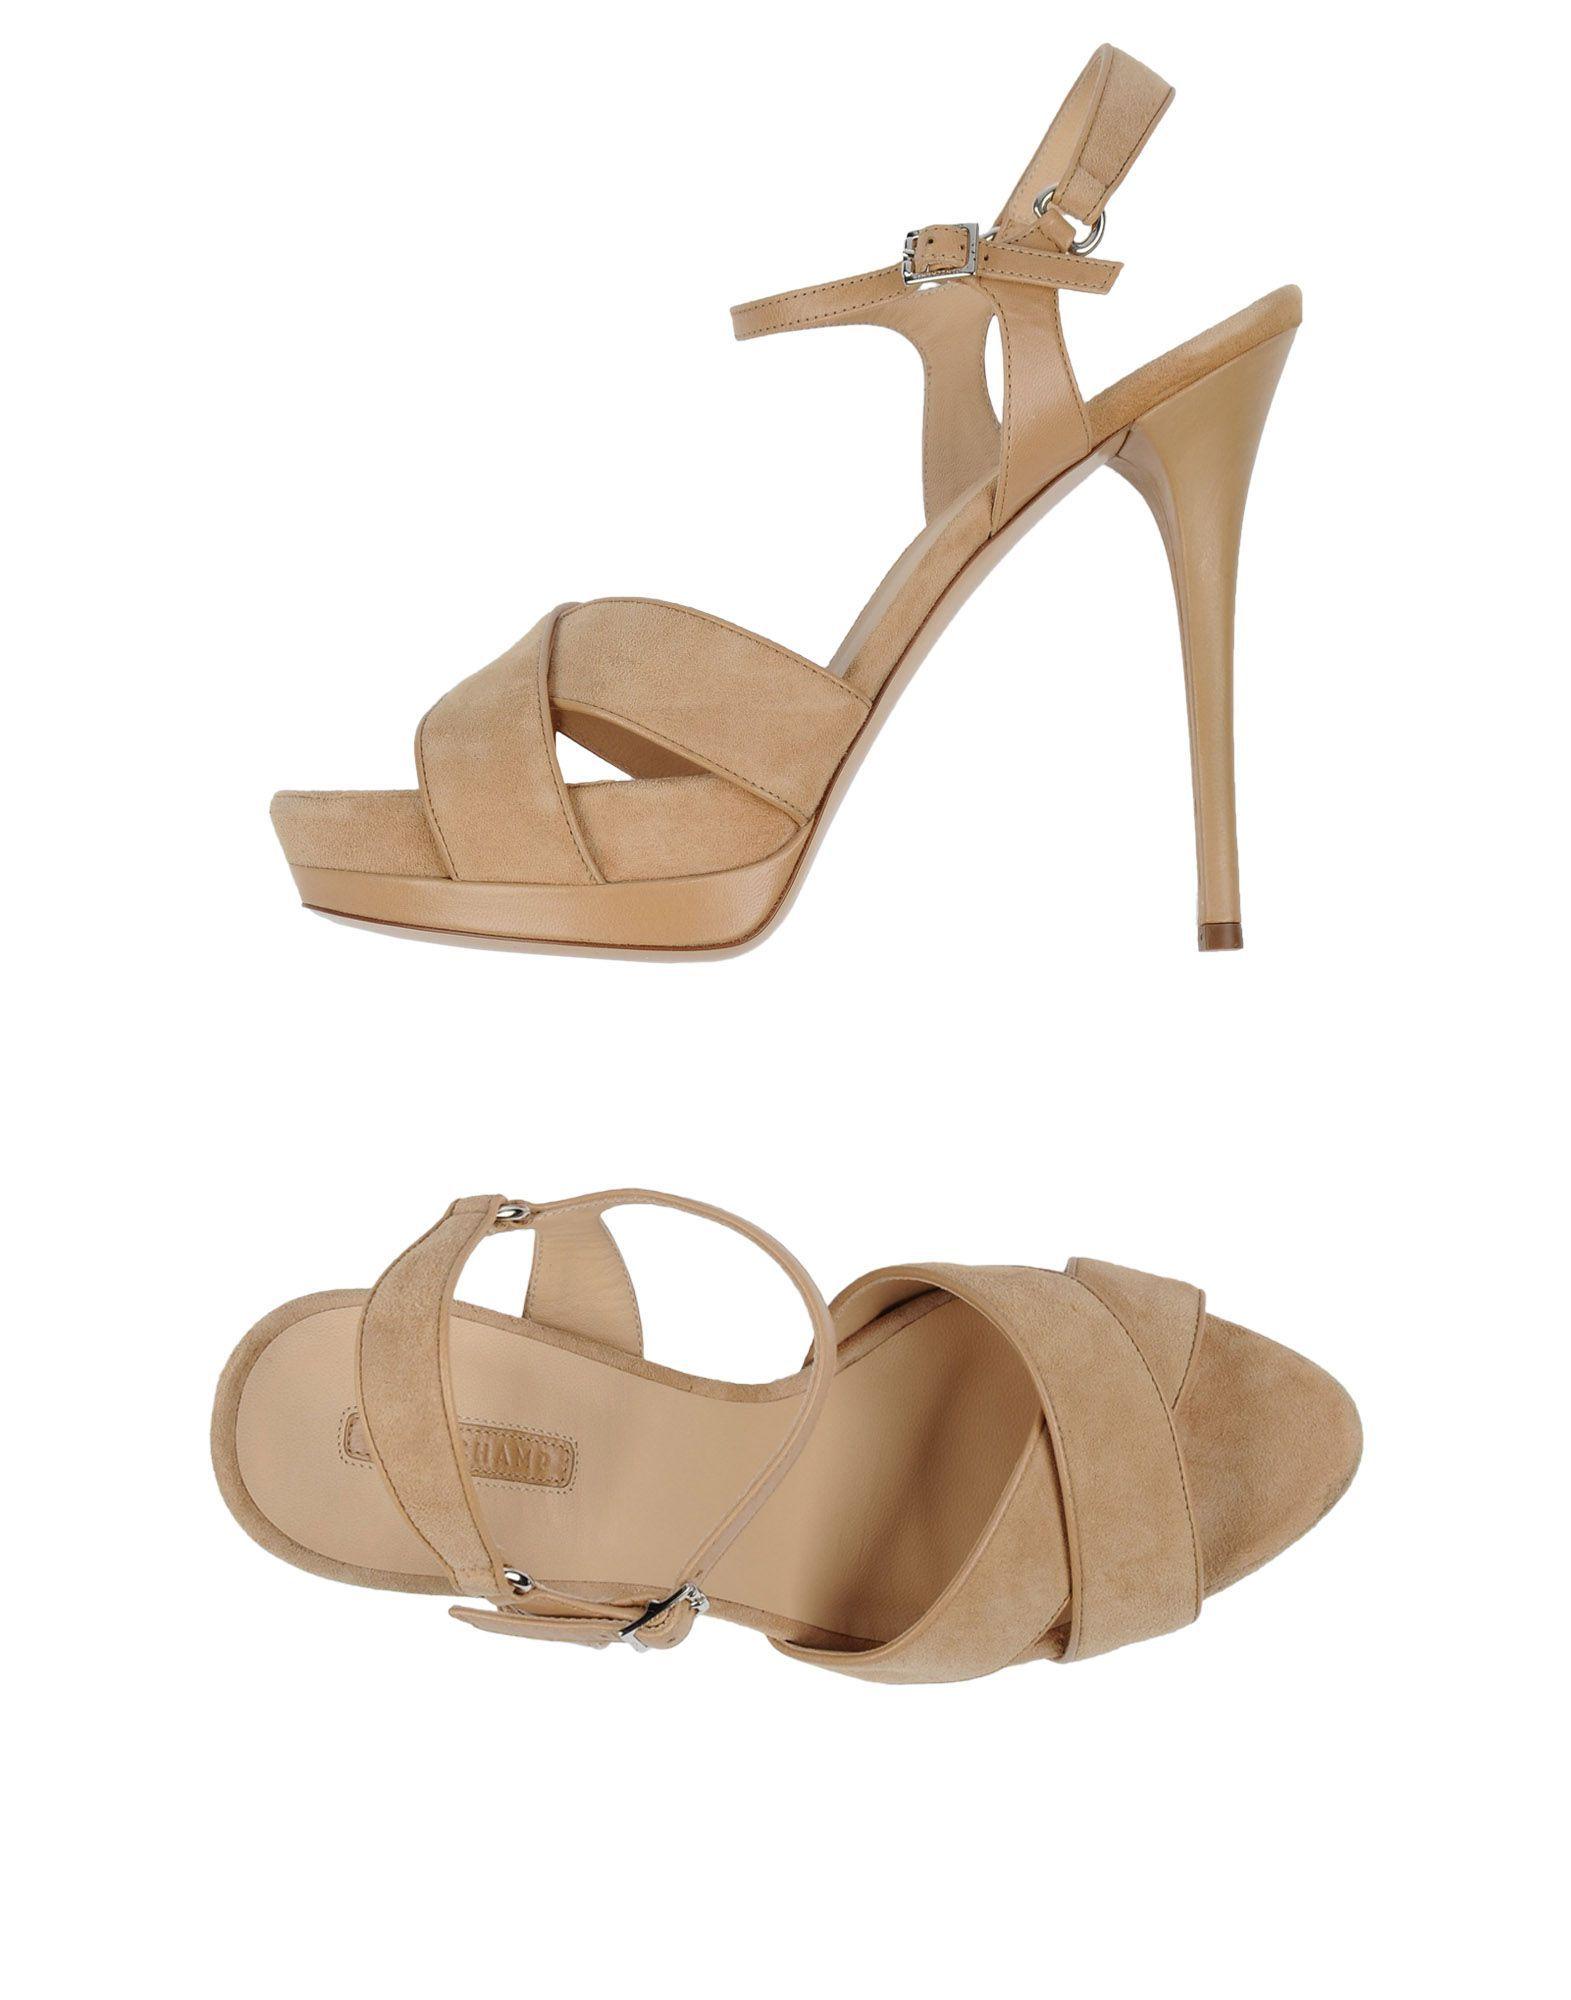 Longchamp Beige Leather Heeled Sandals